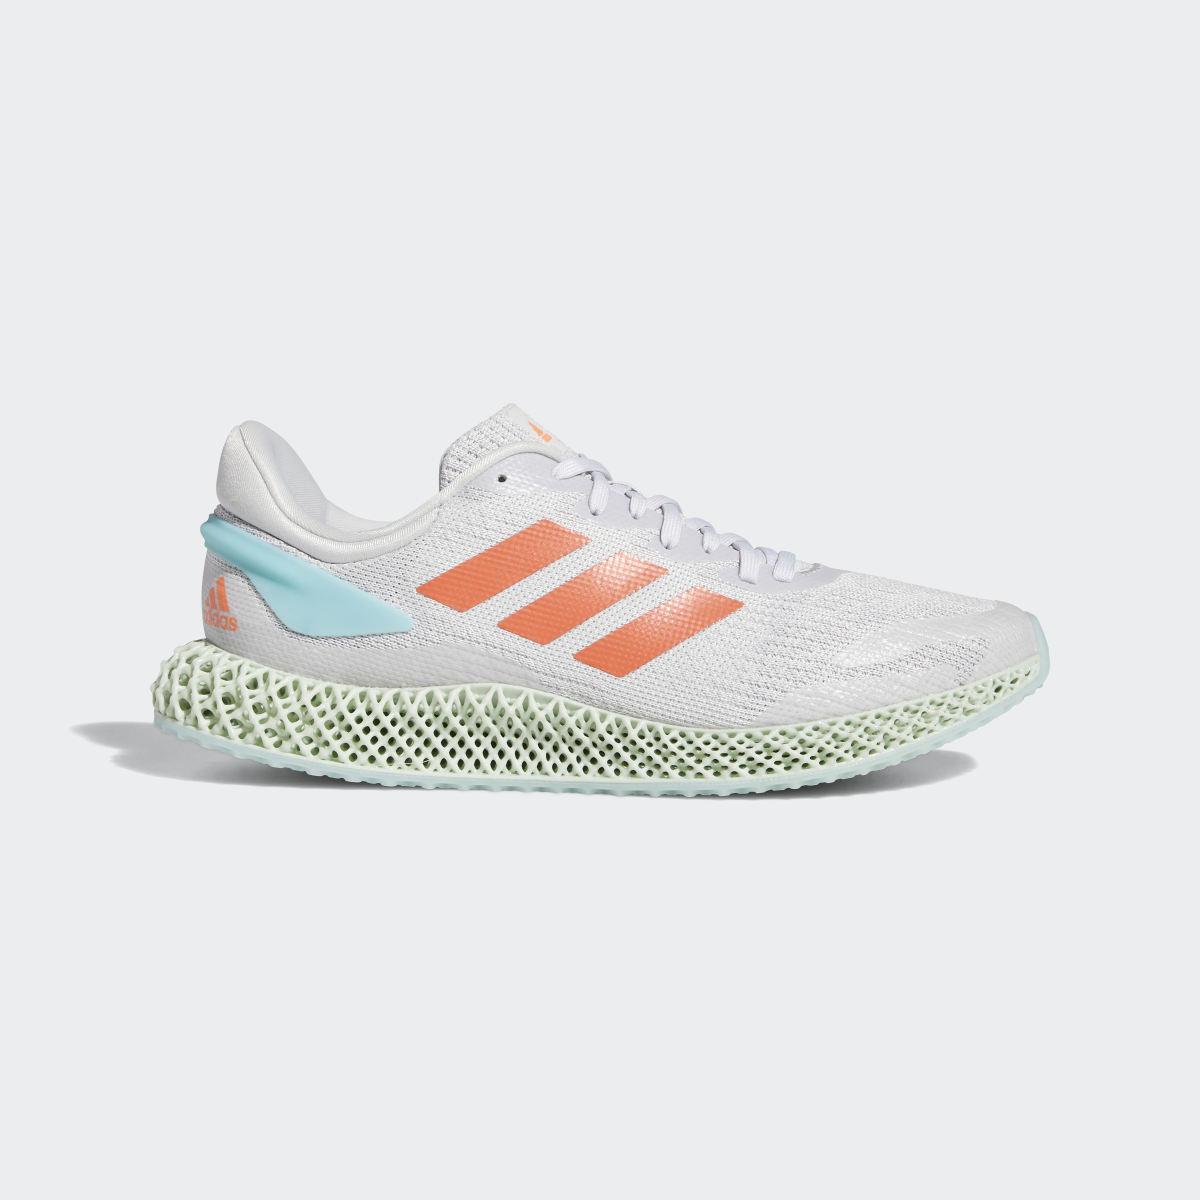 4D RUN 1.0 Parley Shoes